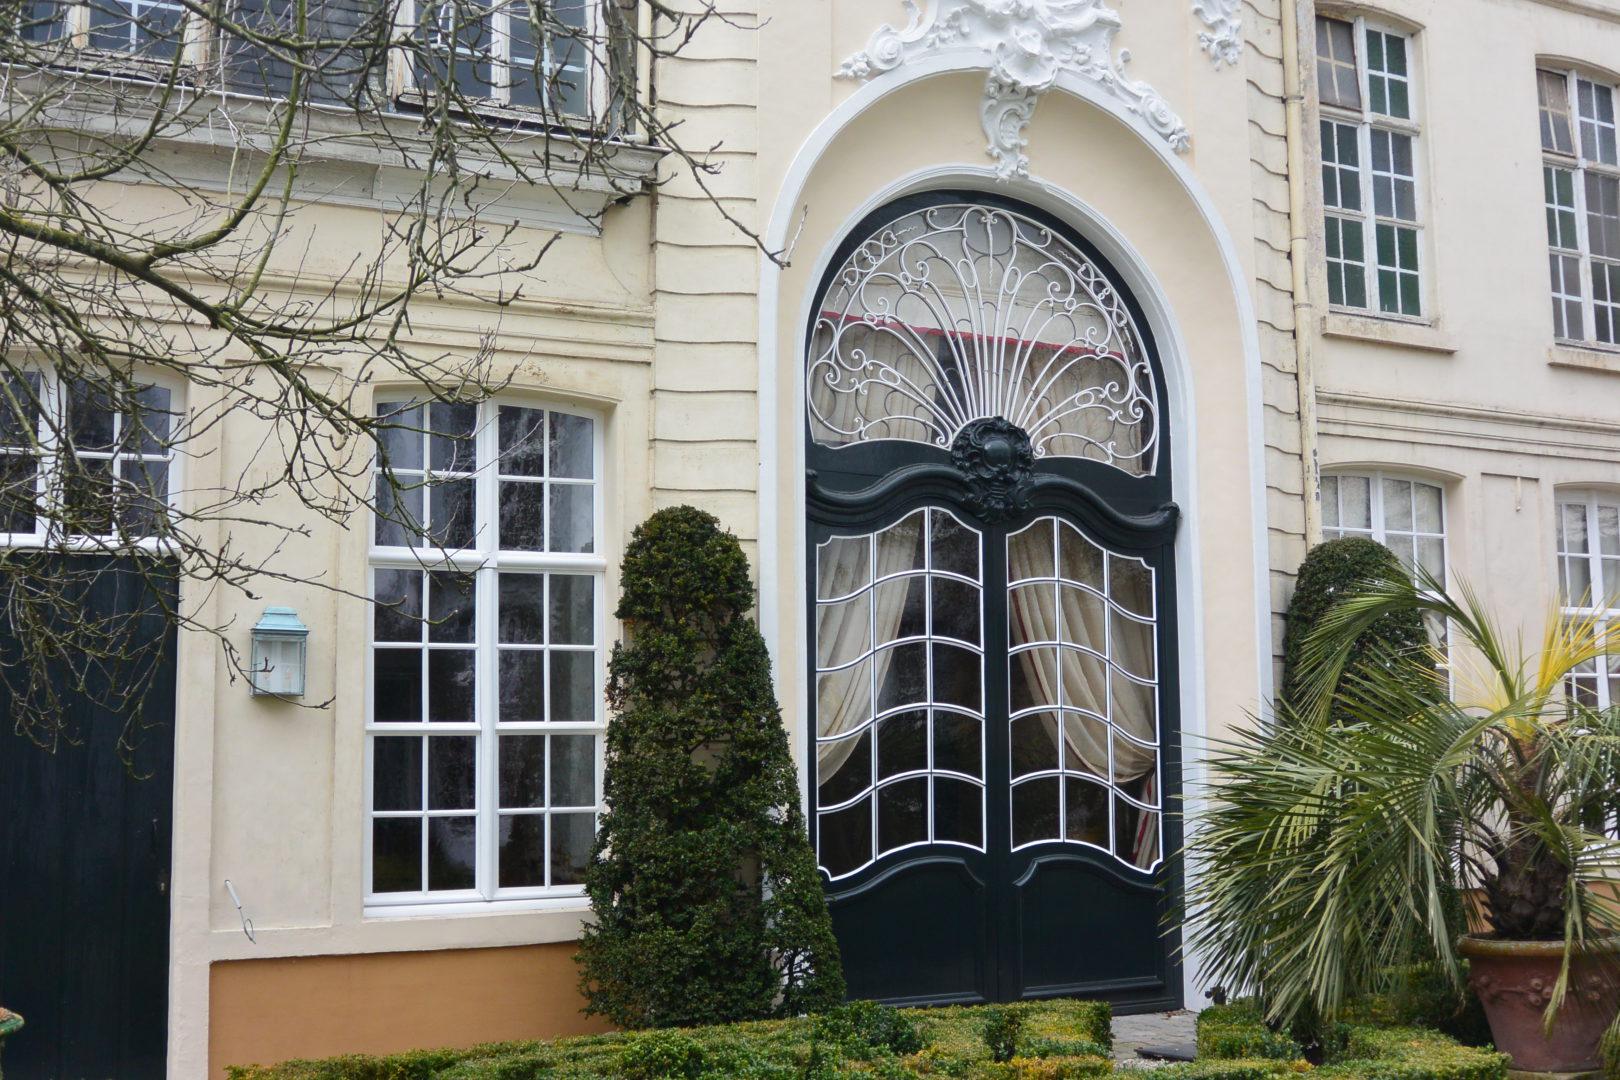 Monumentenglas, glas-in-lood en historisch enkel glas in B&B the Verhaegen, Gent. © Atelier Mestdagh